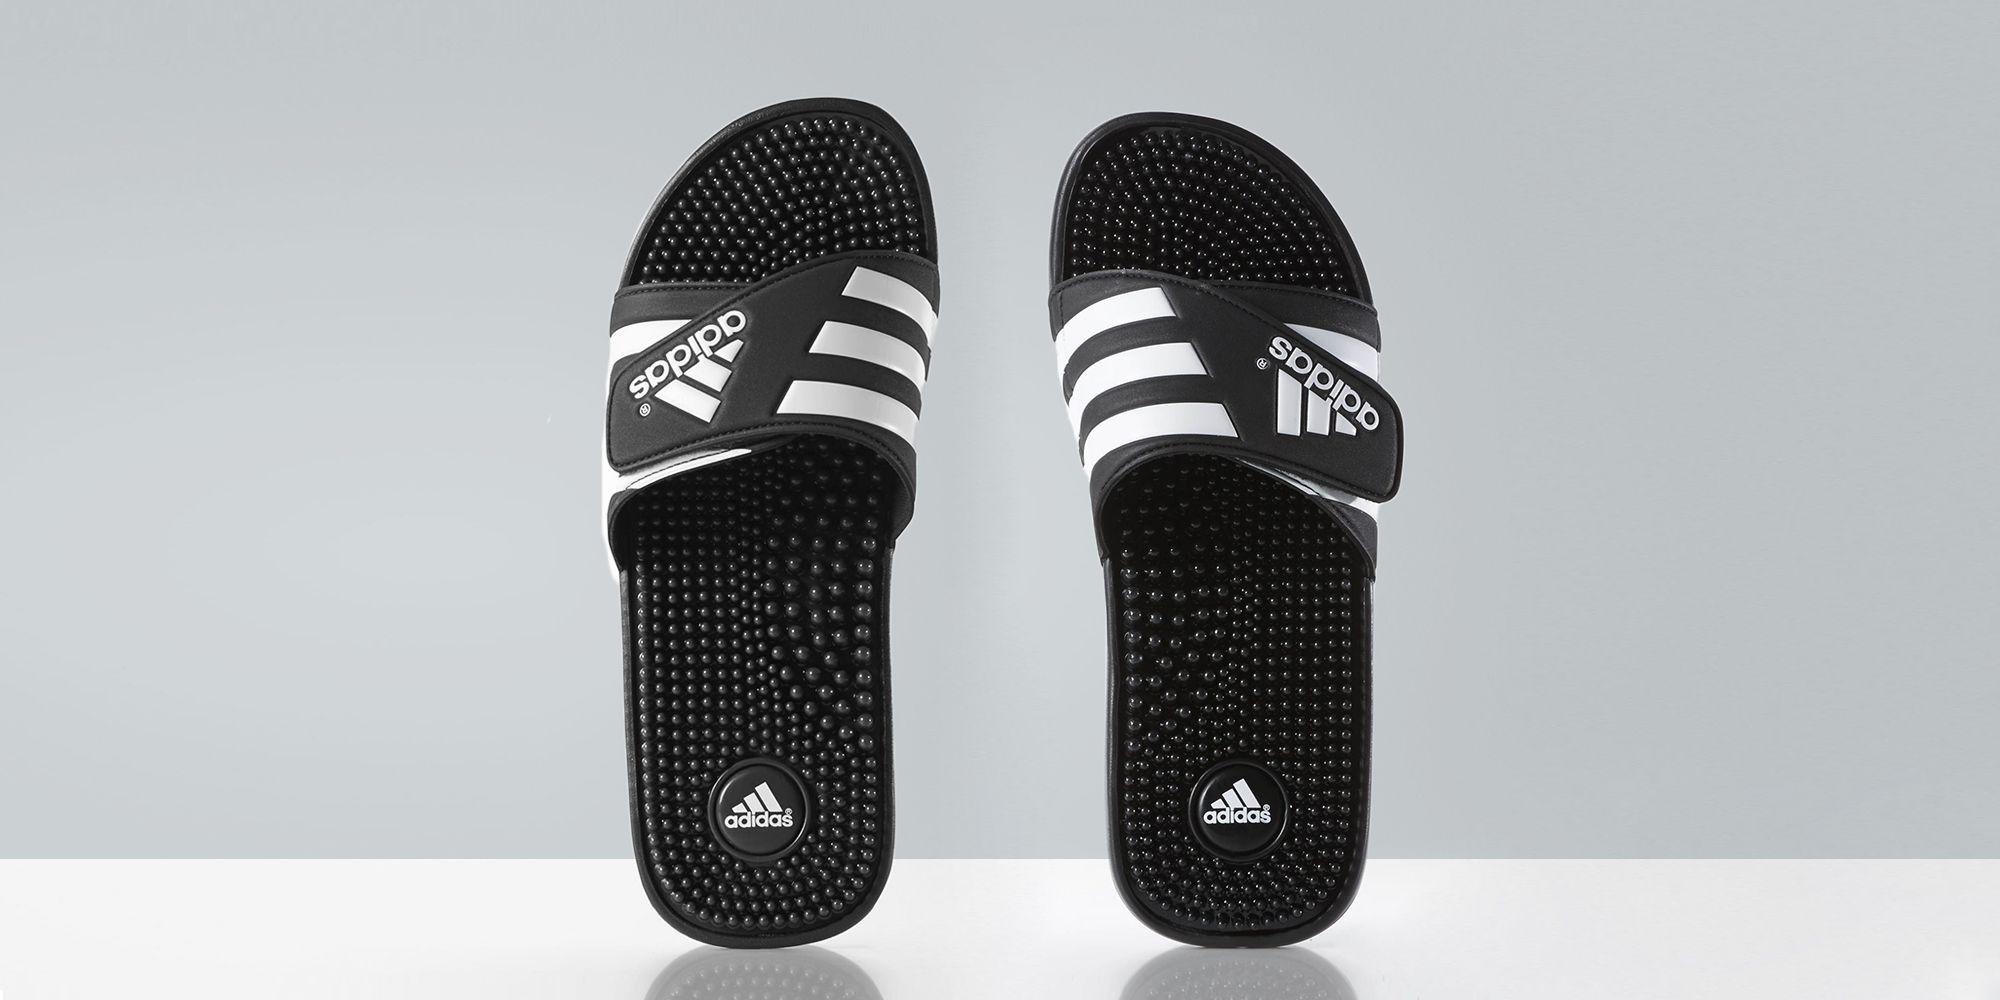 edb14c921 10 Best Sports Sandals for 2018 - Comfortable Sandals for Men   Women